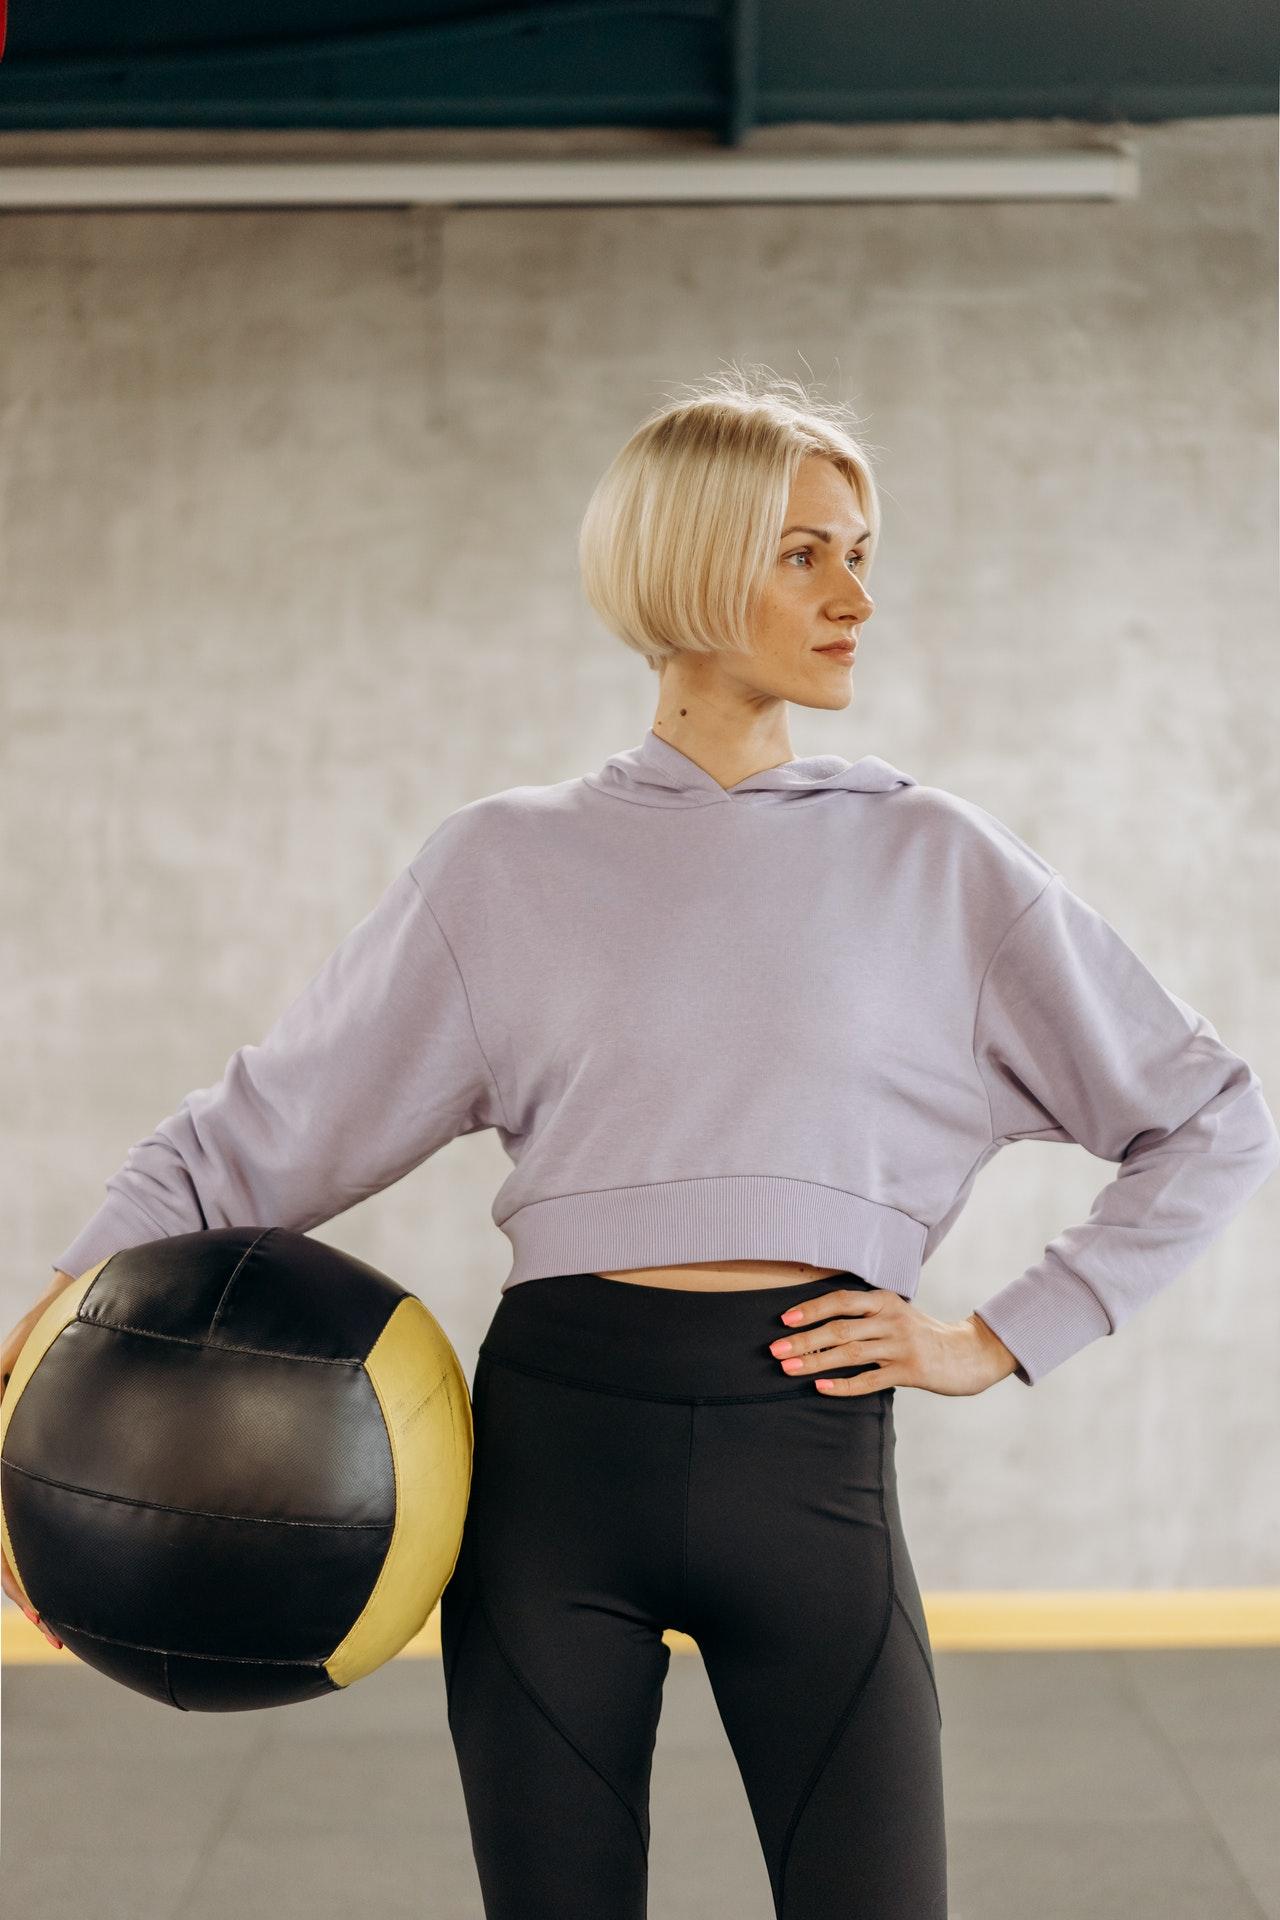 woman doing core exercises